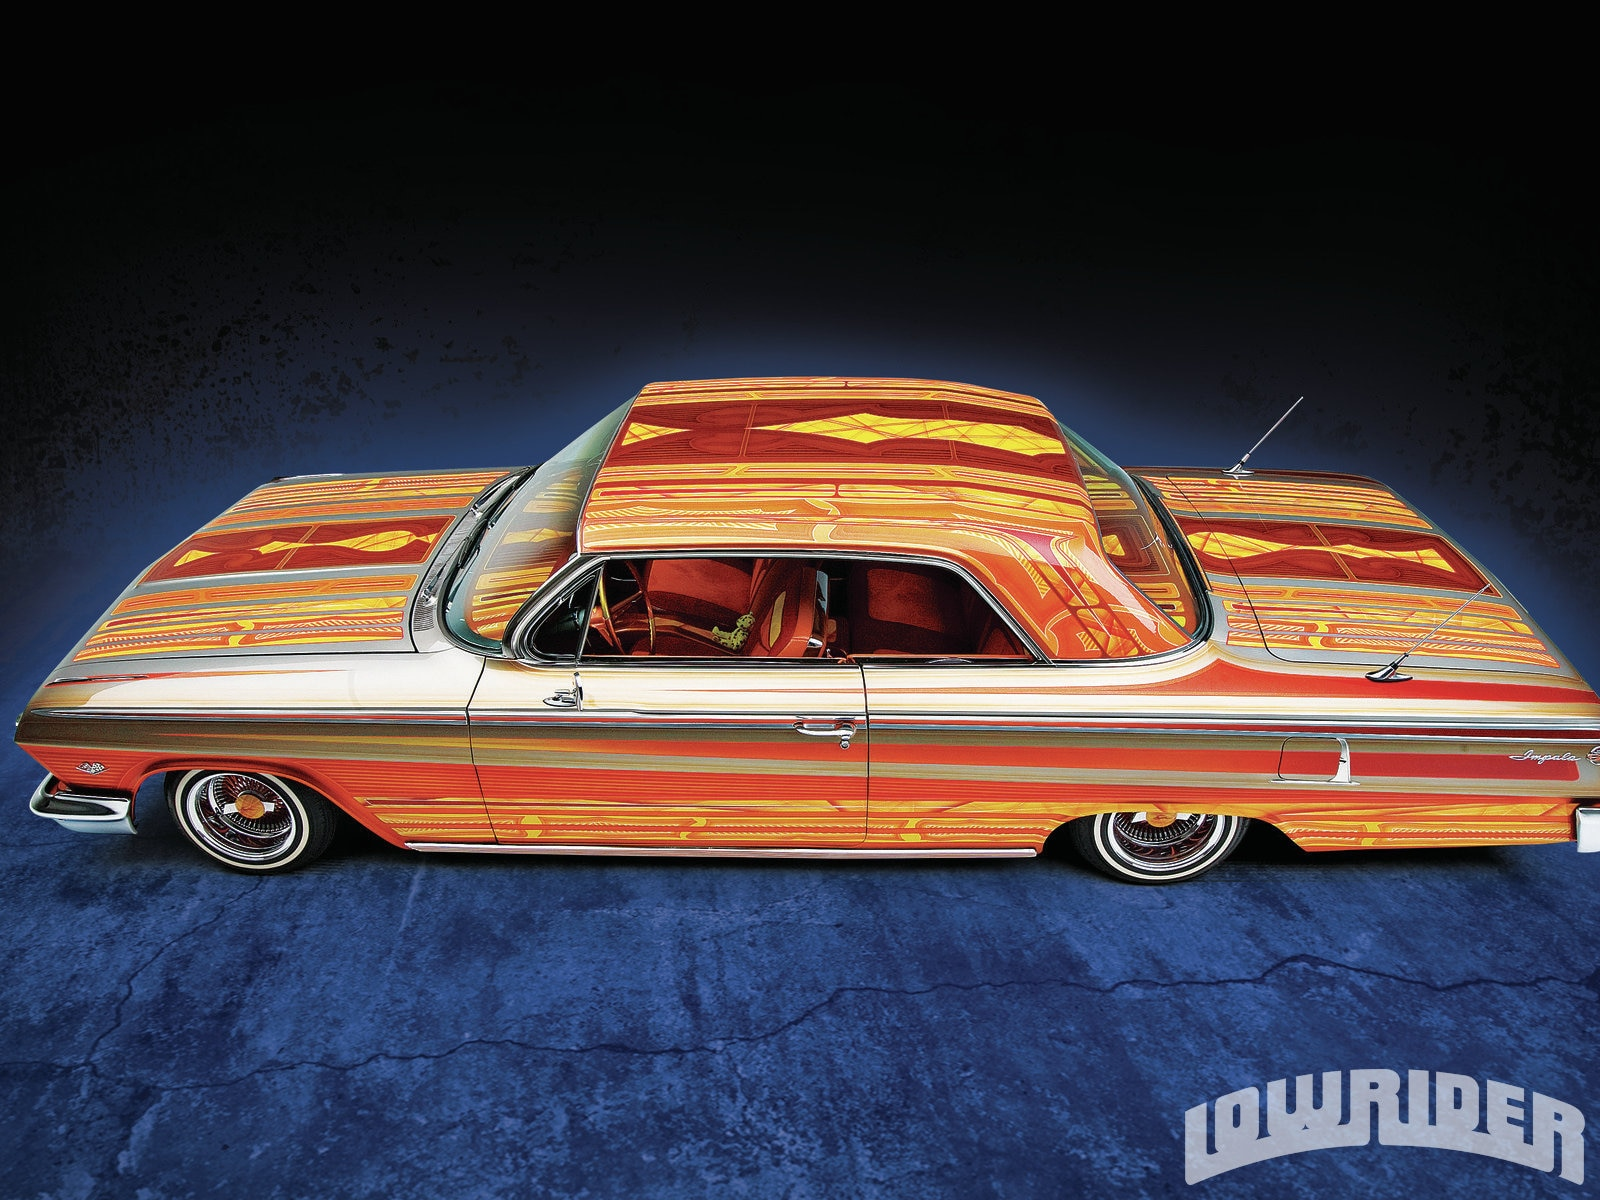 b3a295758664d 1962 Chevrolet Impala SS - Lowrider Magazine